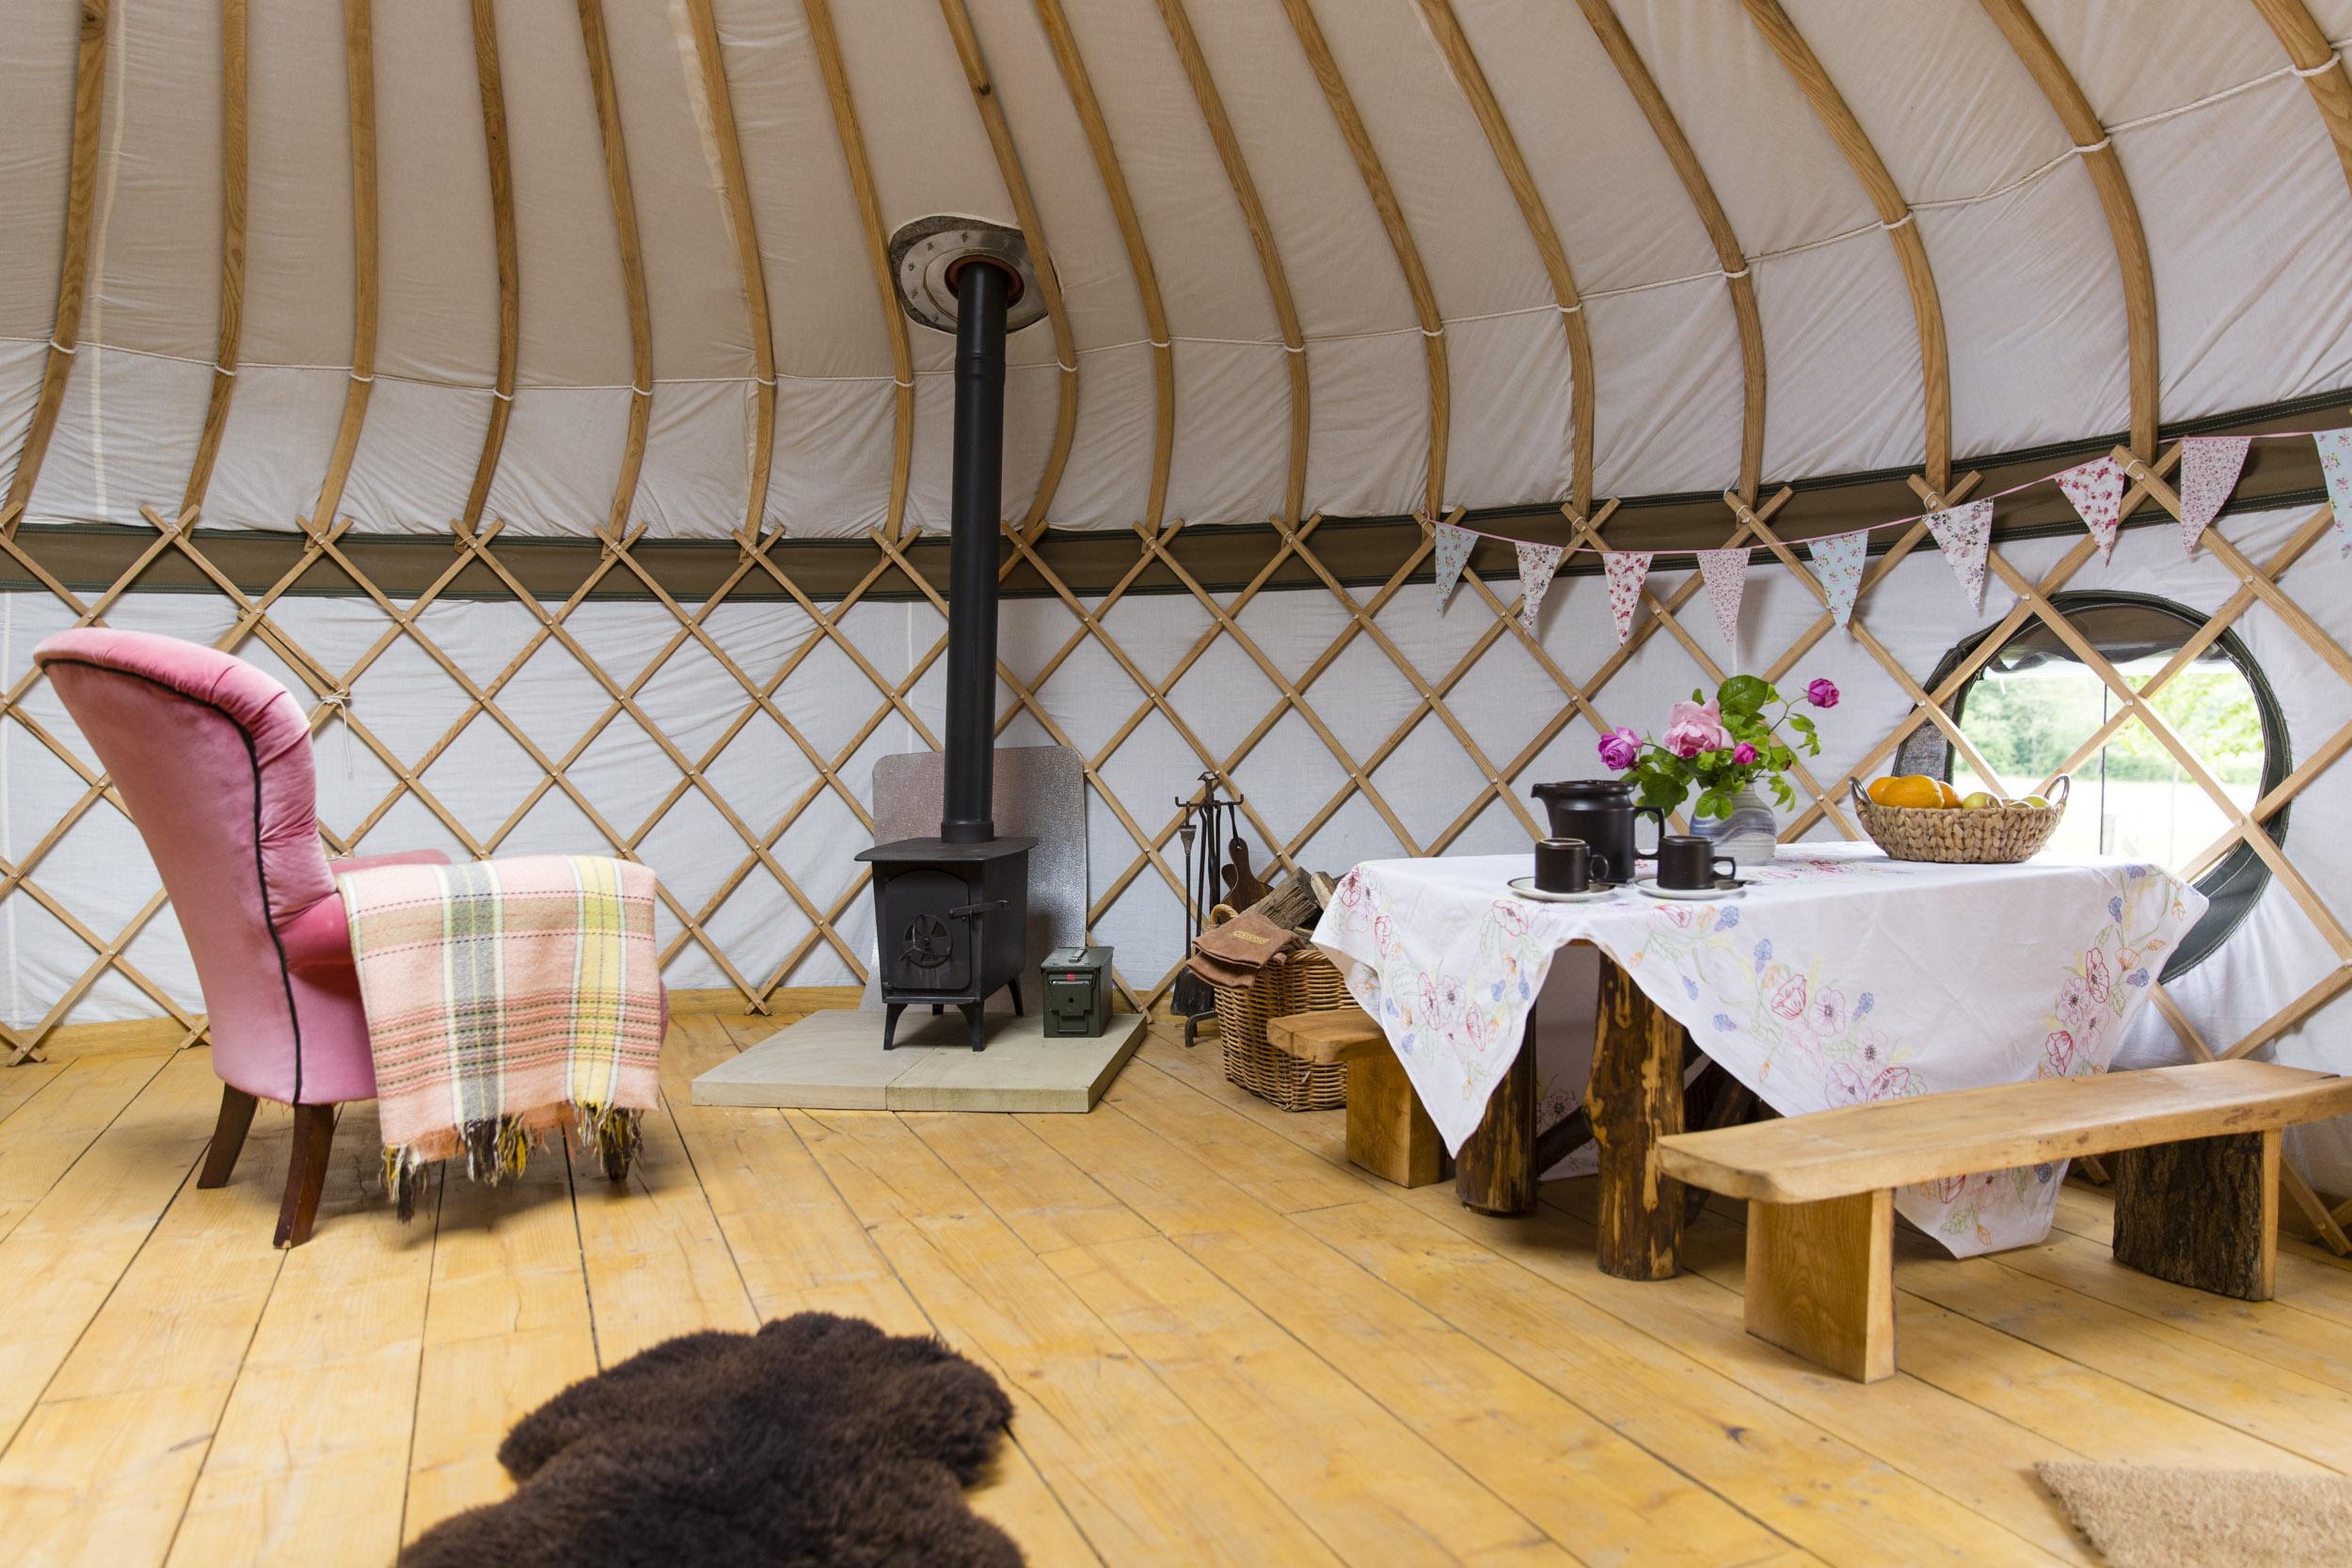 London Commercial Photographer, Surrey Hills Yurts